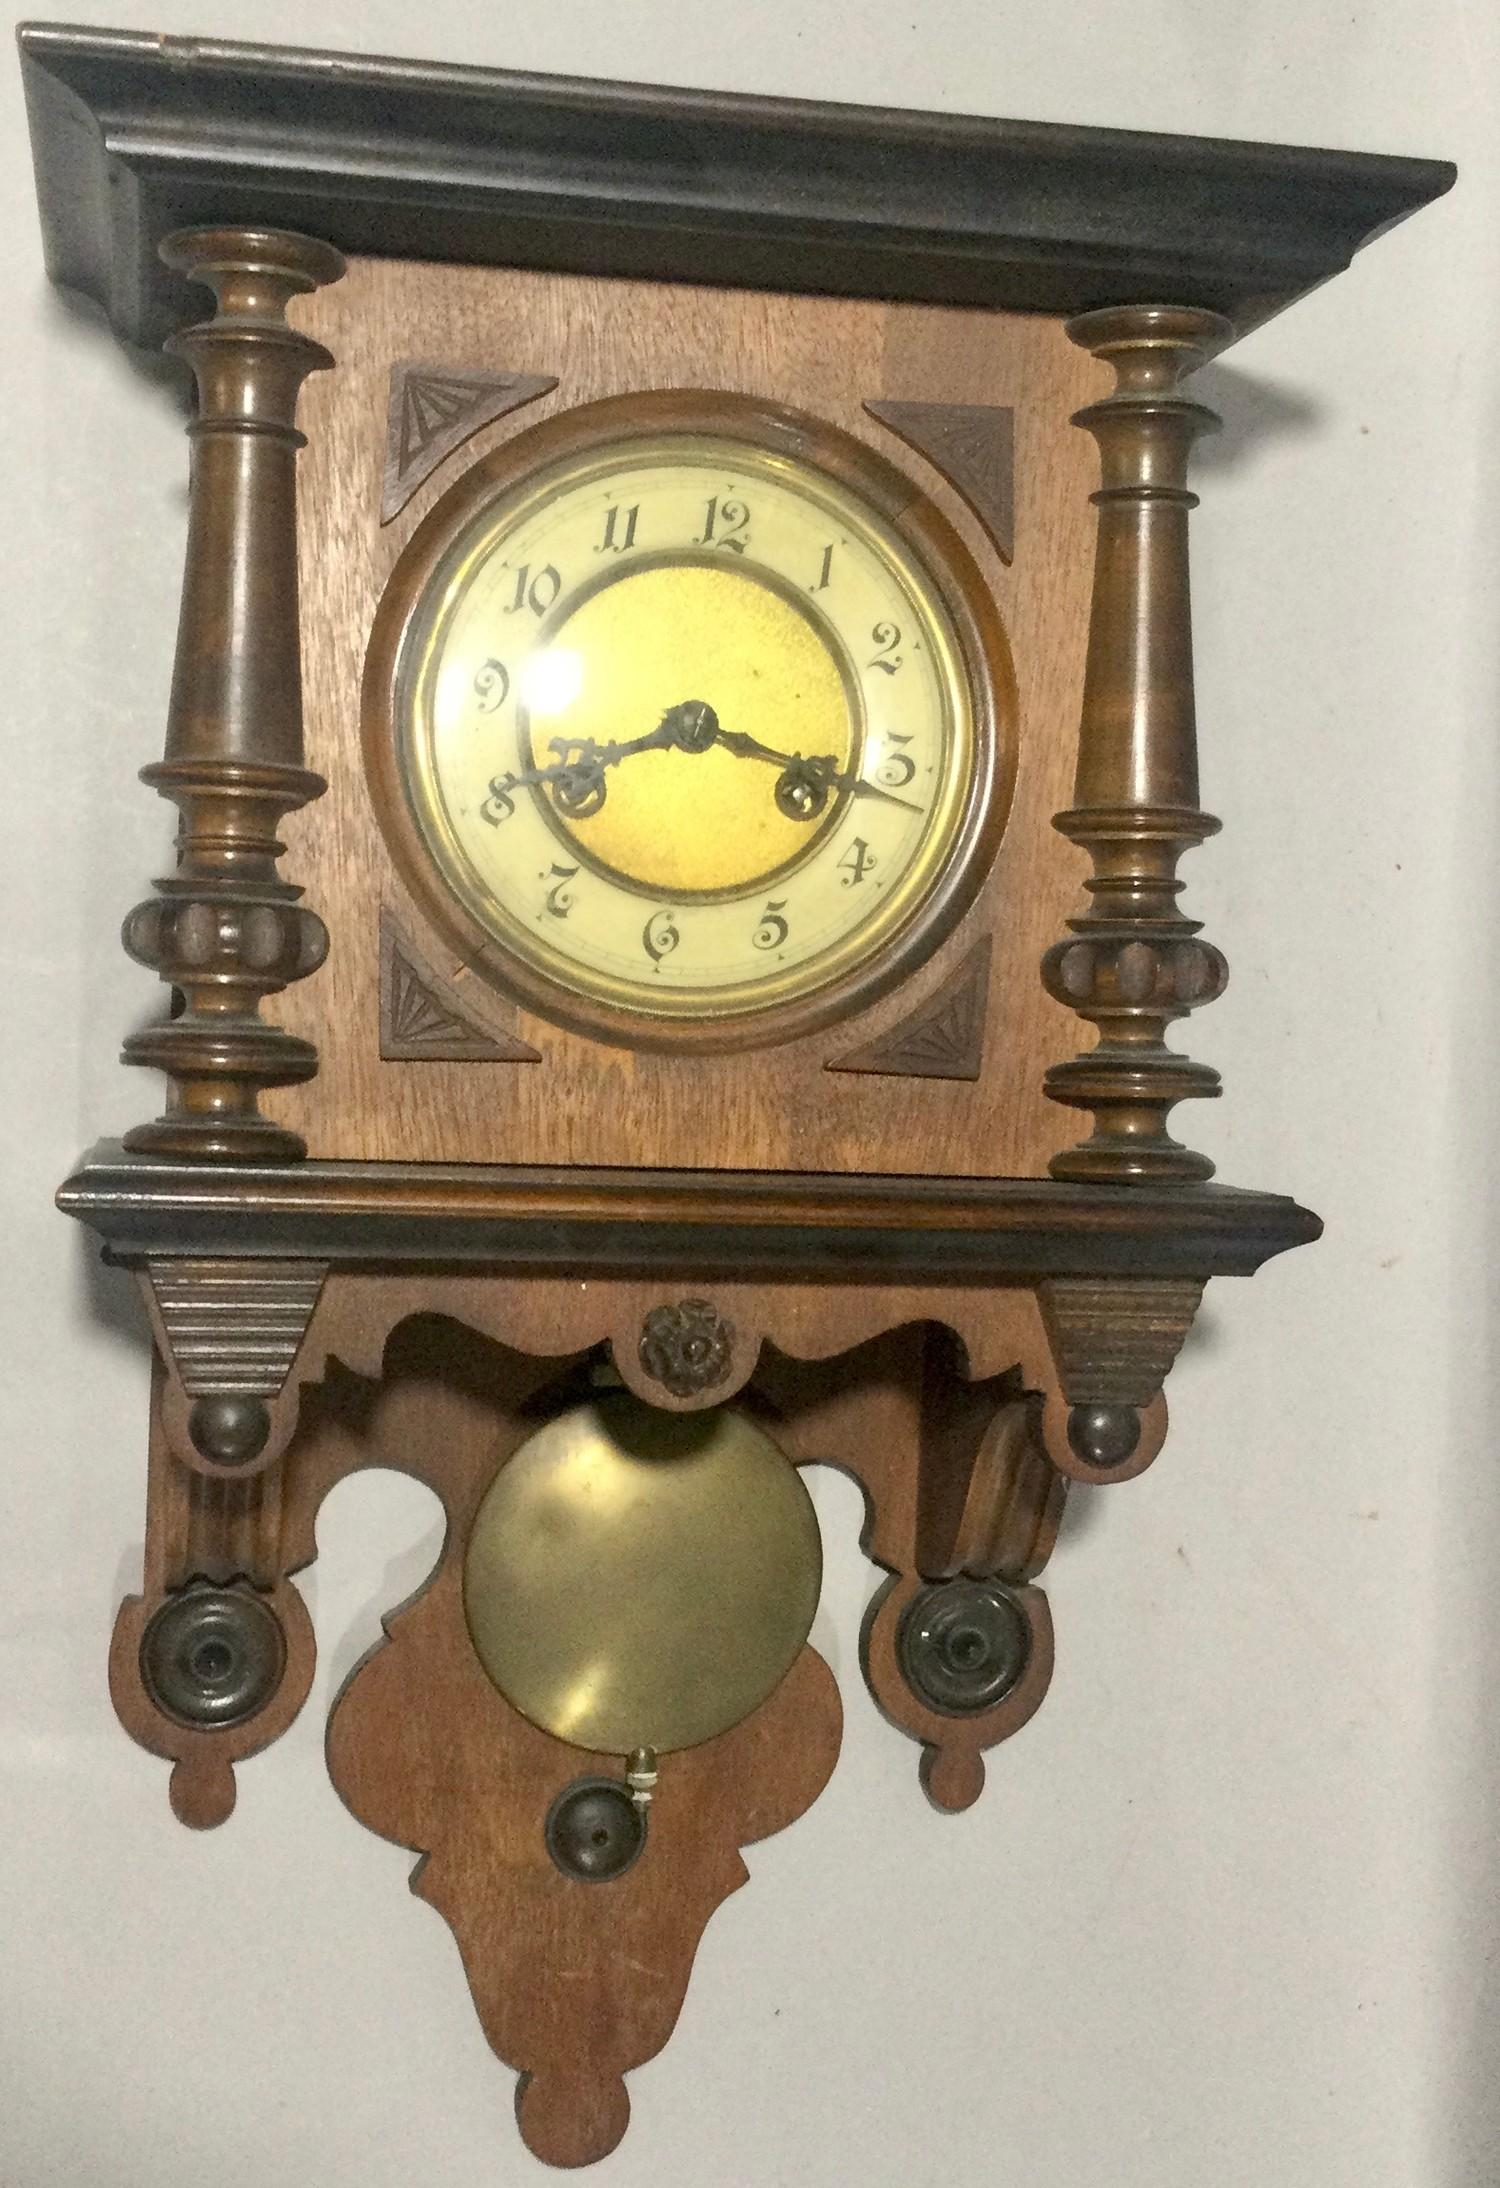 Mahogany striking wall clock with pendulum